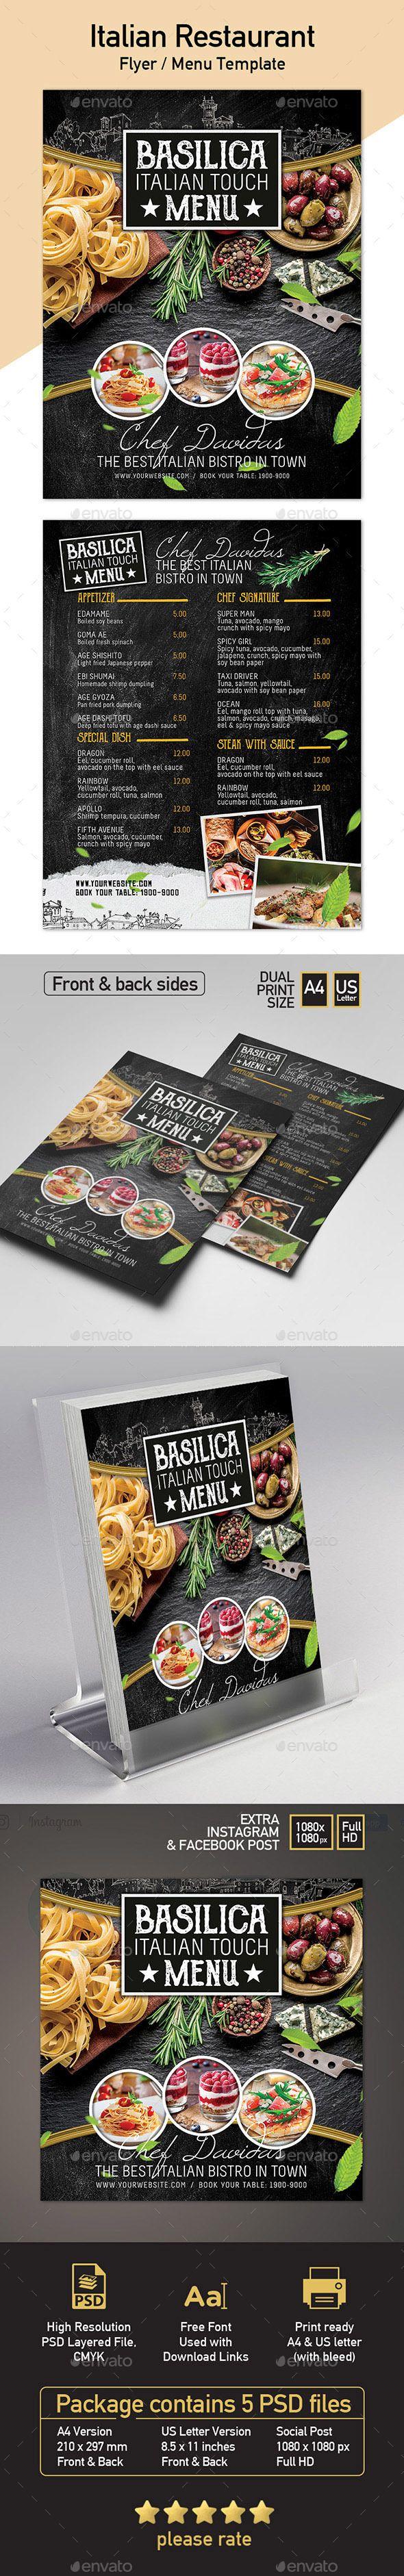 #Restaurant #Menu Template - A4 & US Letter - #Restaurant Flyers